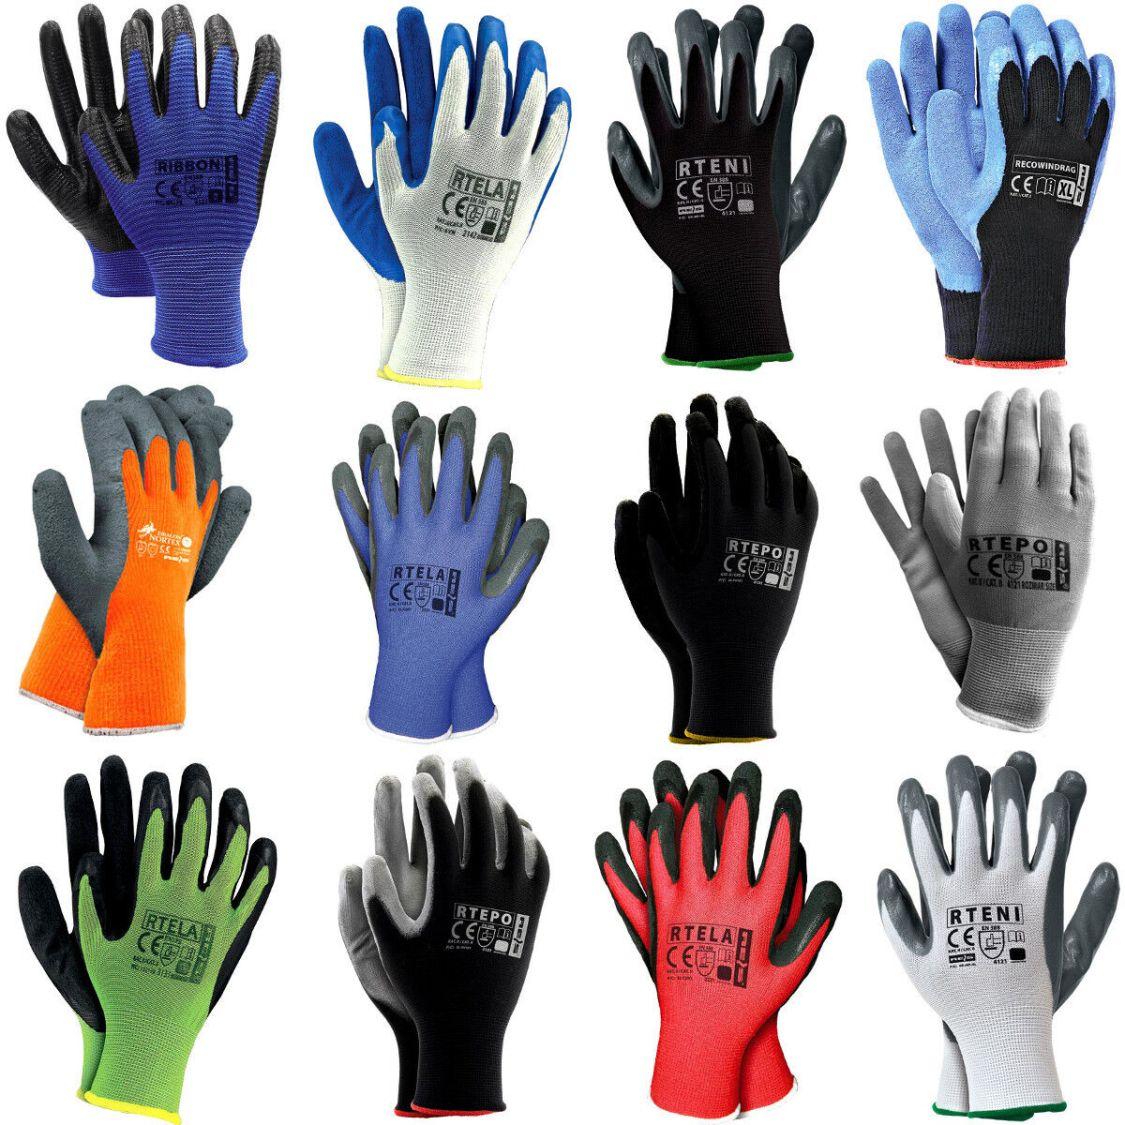 Arbeitshandschuhe Gartenhandschuhe Handschuhe Montagehandschuhe Gr. 7-10